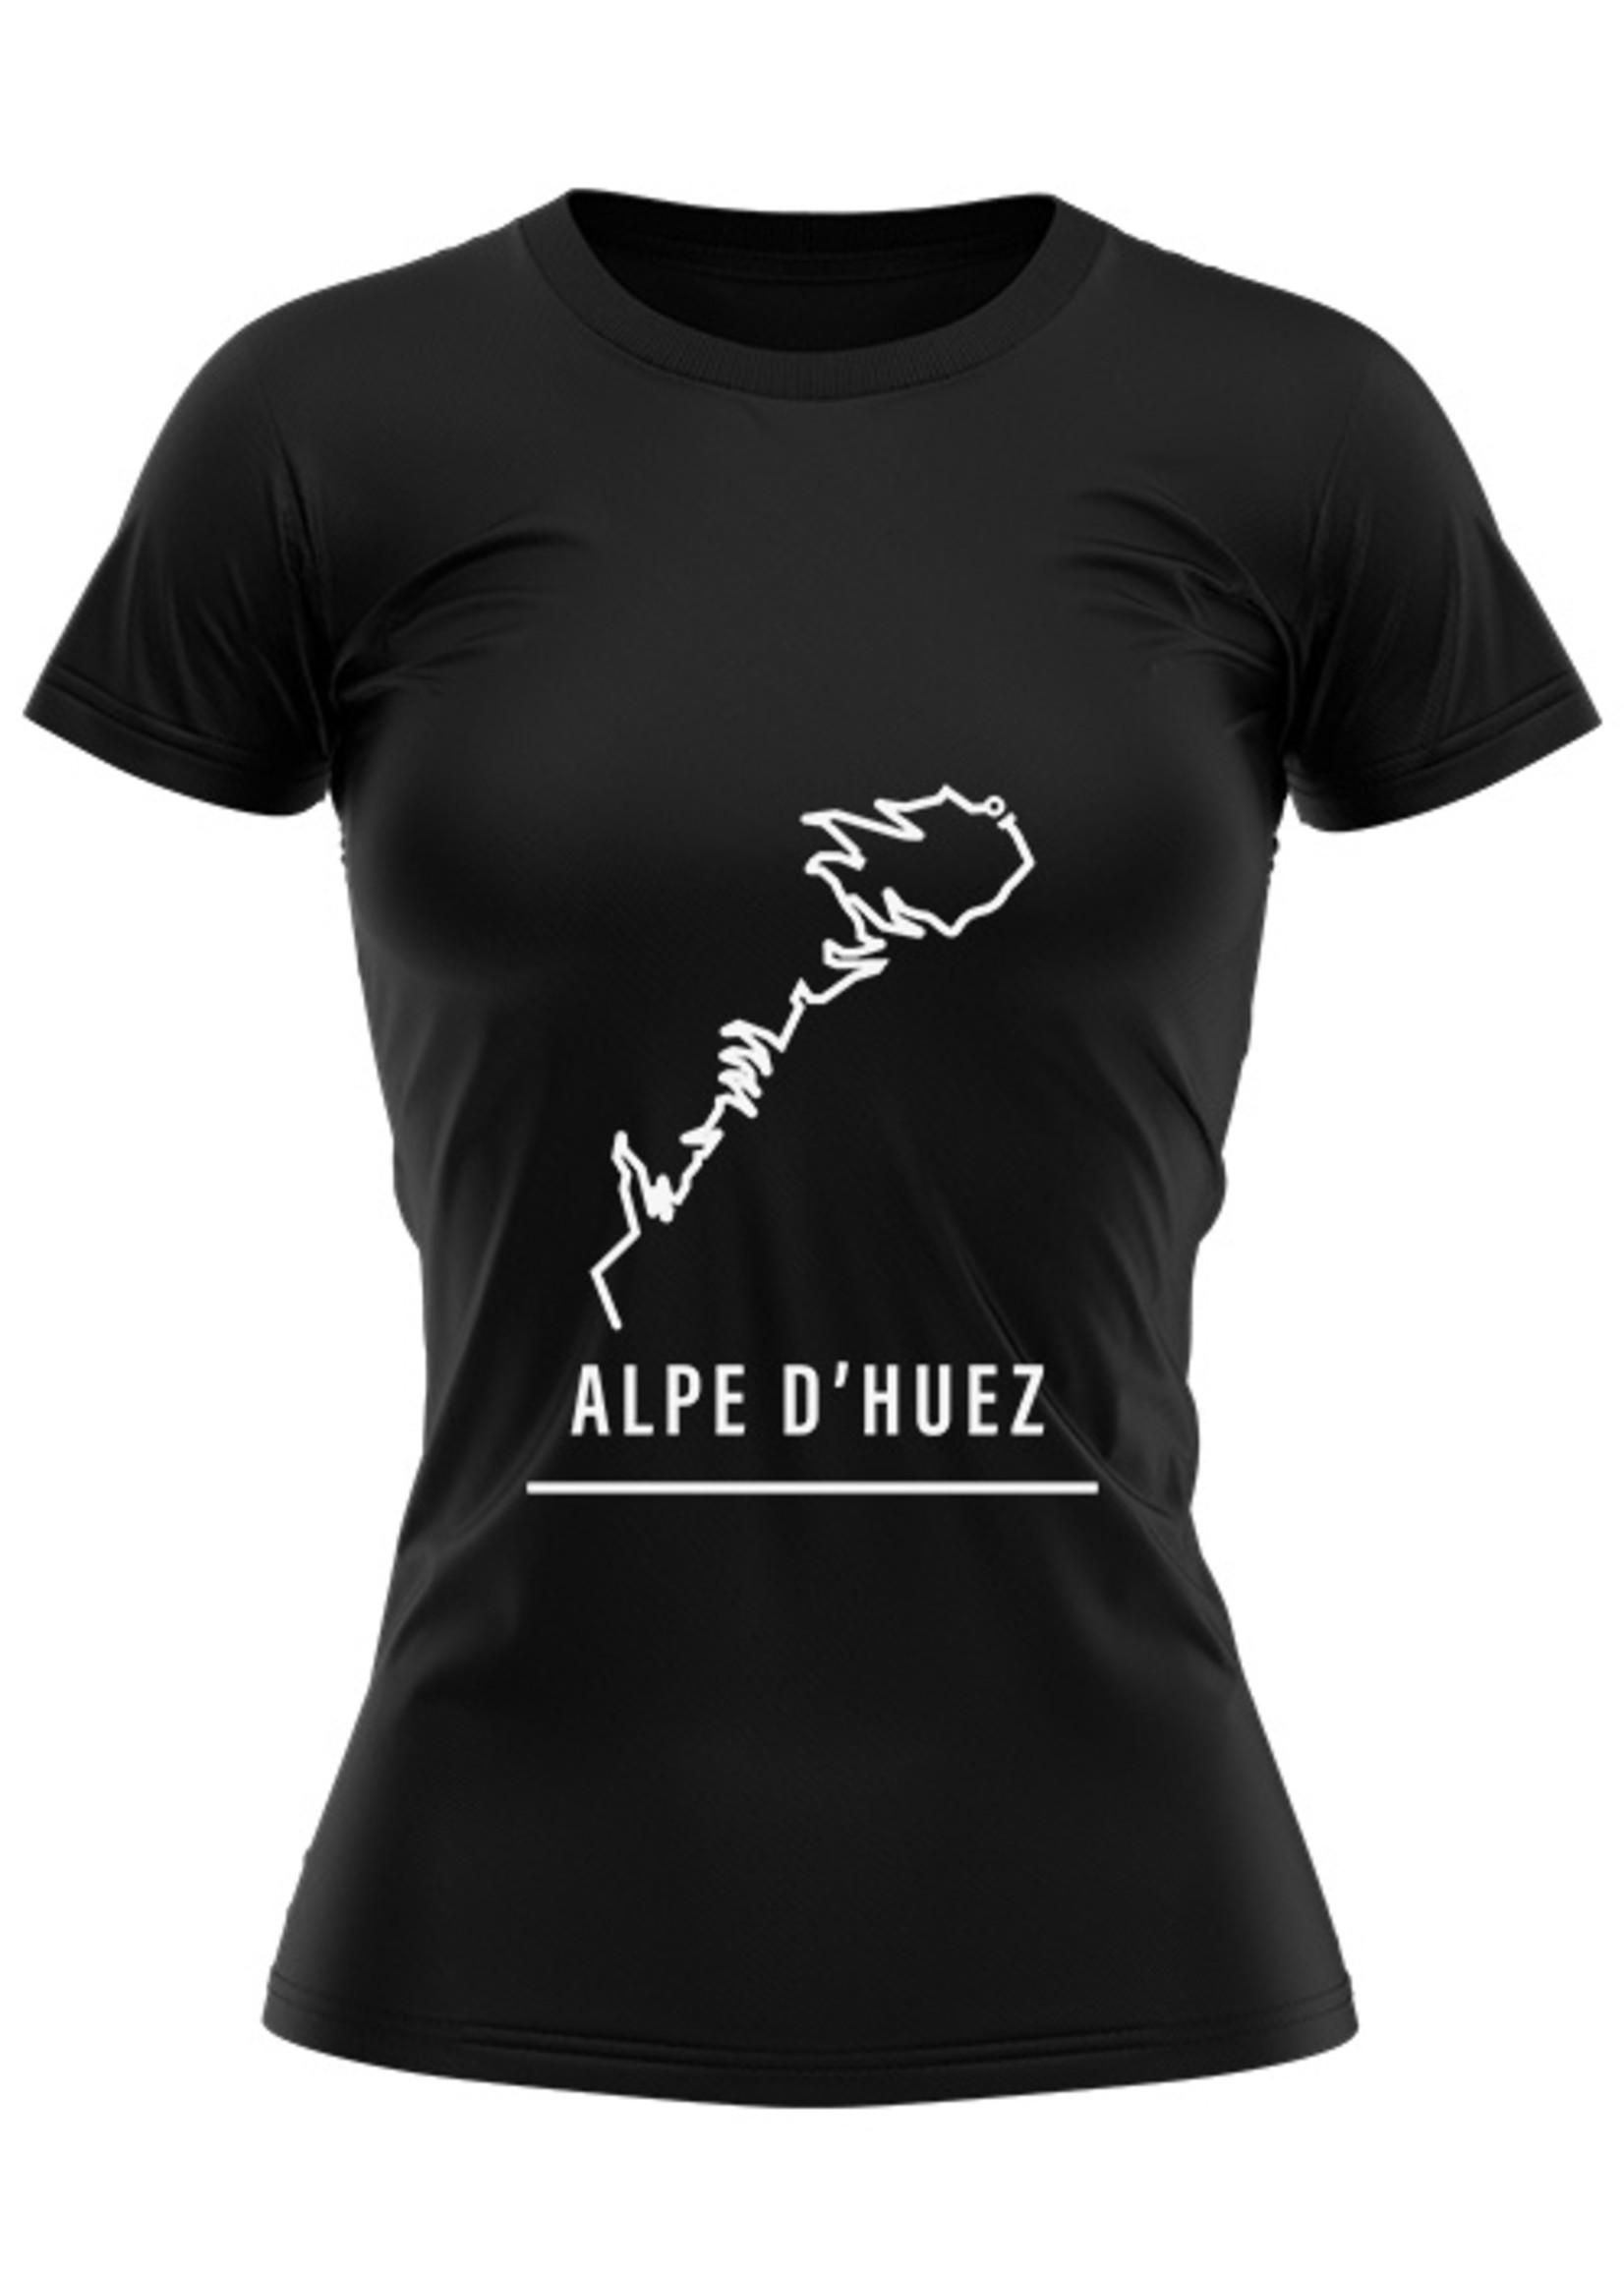 Rebel & Dutch Casual shirt Alpe d'huez